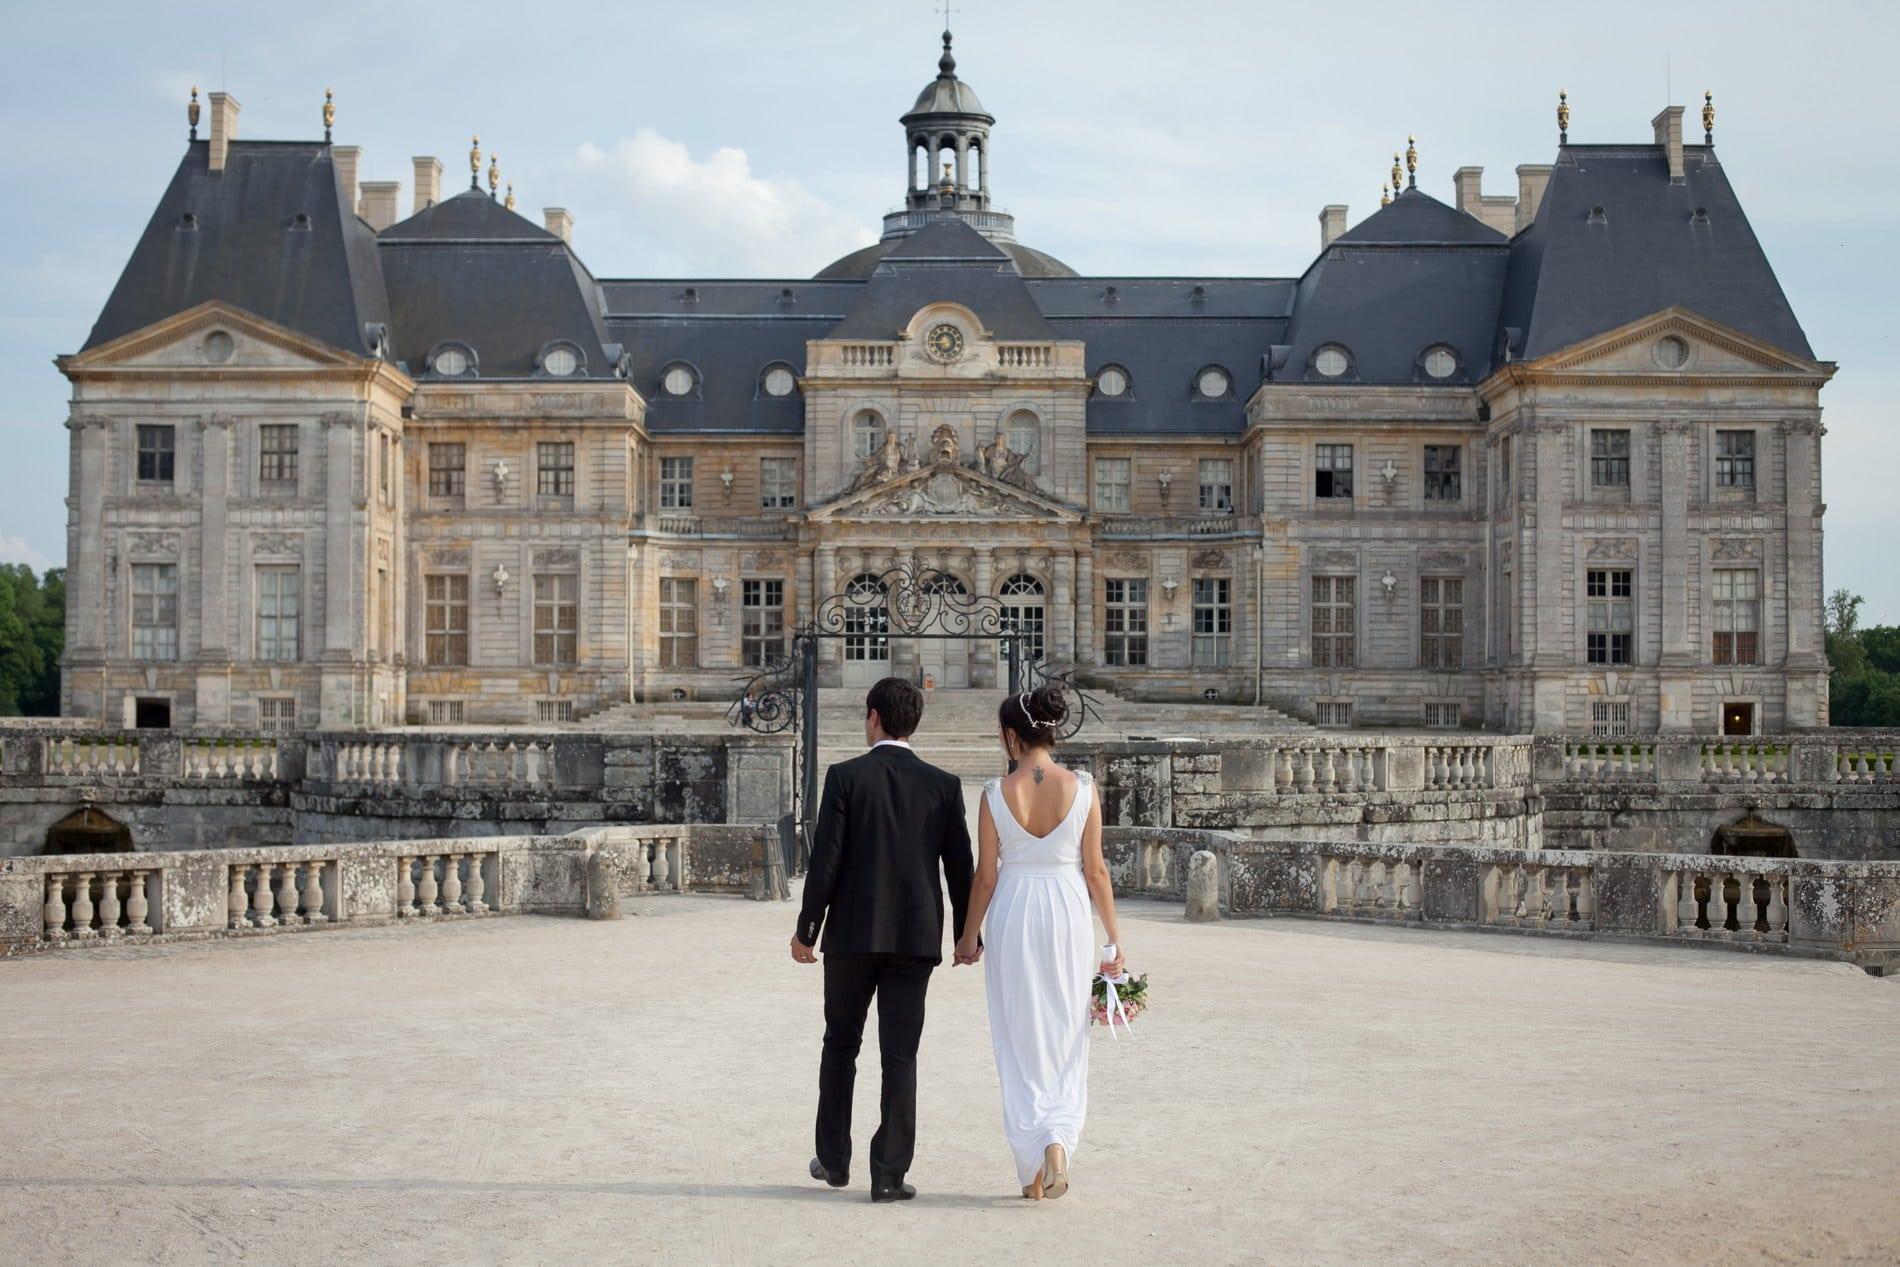 Wedding in Paris: wedding planner recommends wedding venues